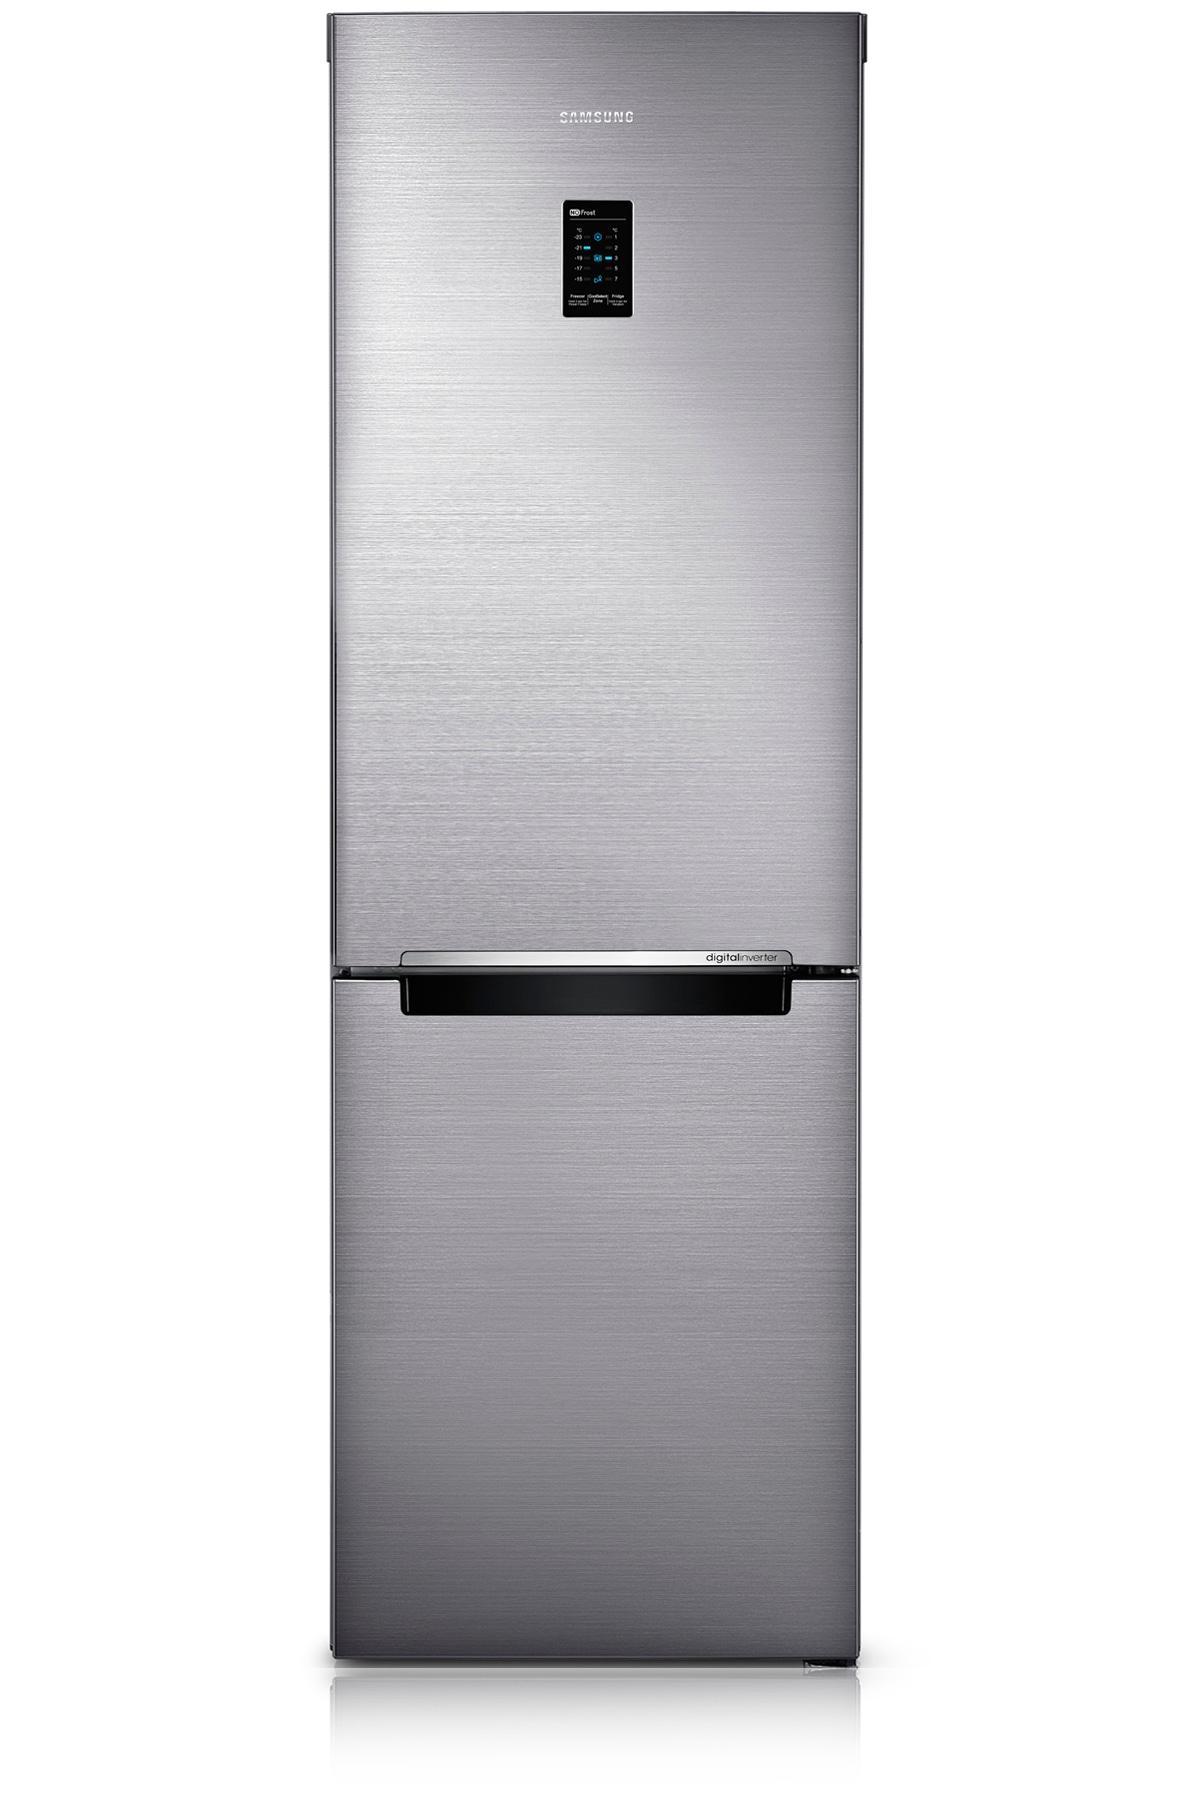 Rb31 Fridge Freezer With Digital Inverter Technology 304